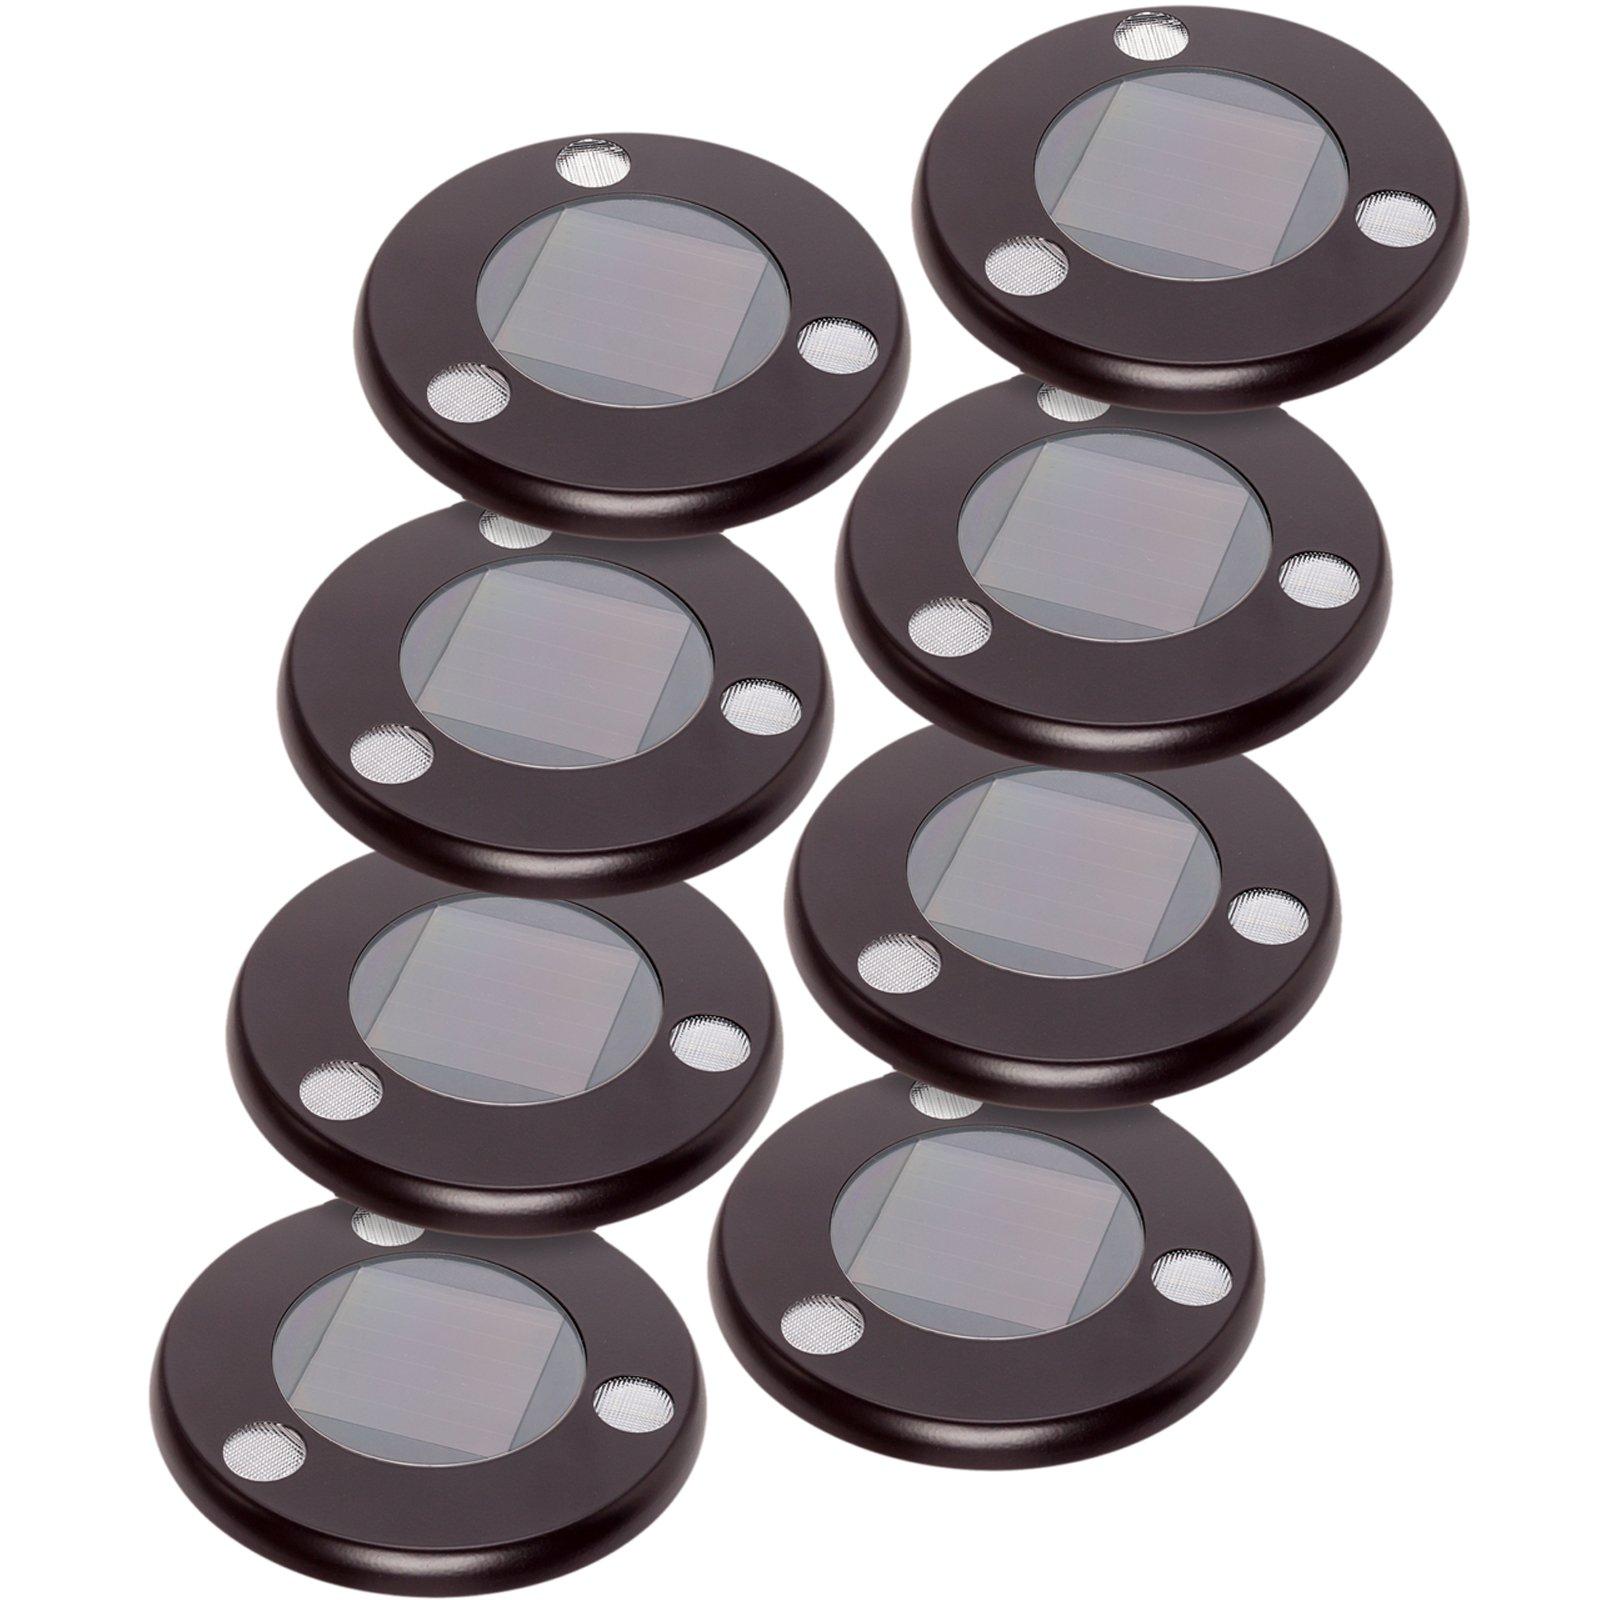 GreenLighting Solar Flat In-Ground Driveway Light Set 8 Pack (Remington Bronze)